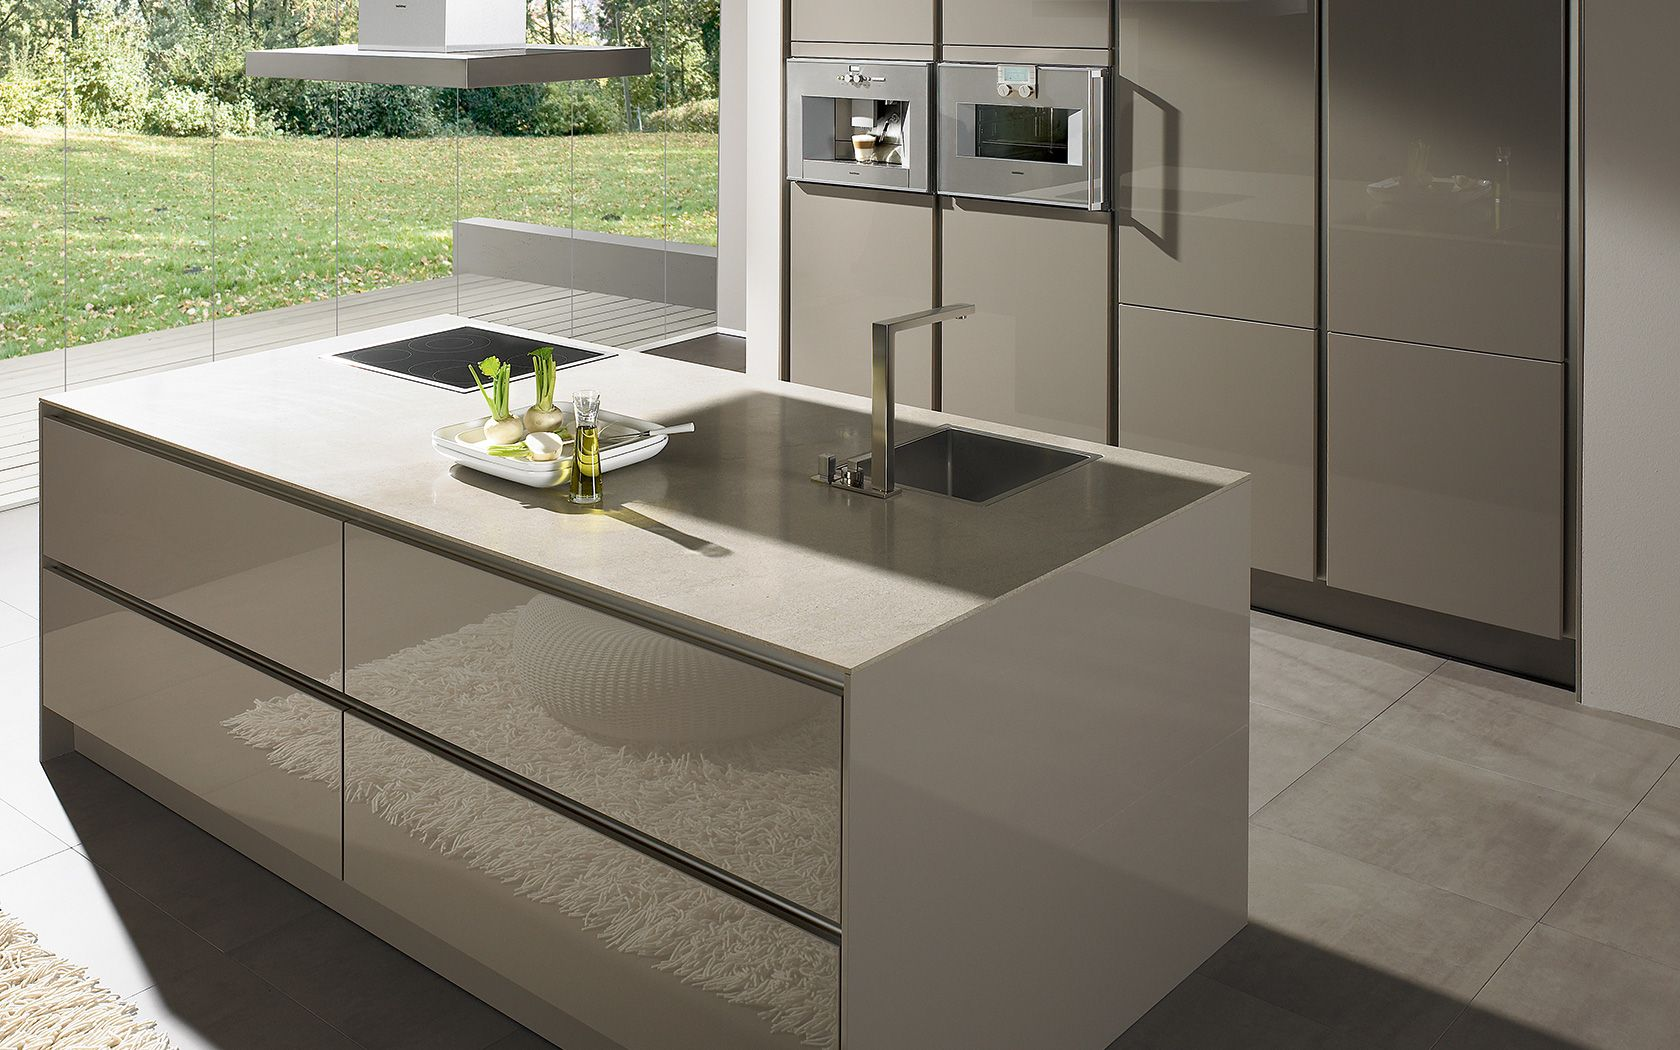 moderne k che ohne griff s2 k che pinterest arbeitsplatte siematic k che. Black Bedroom Furniture Sets. Home Design Ideas